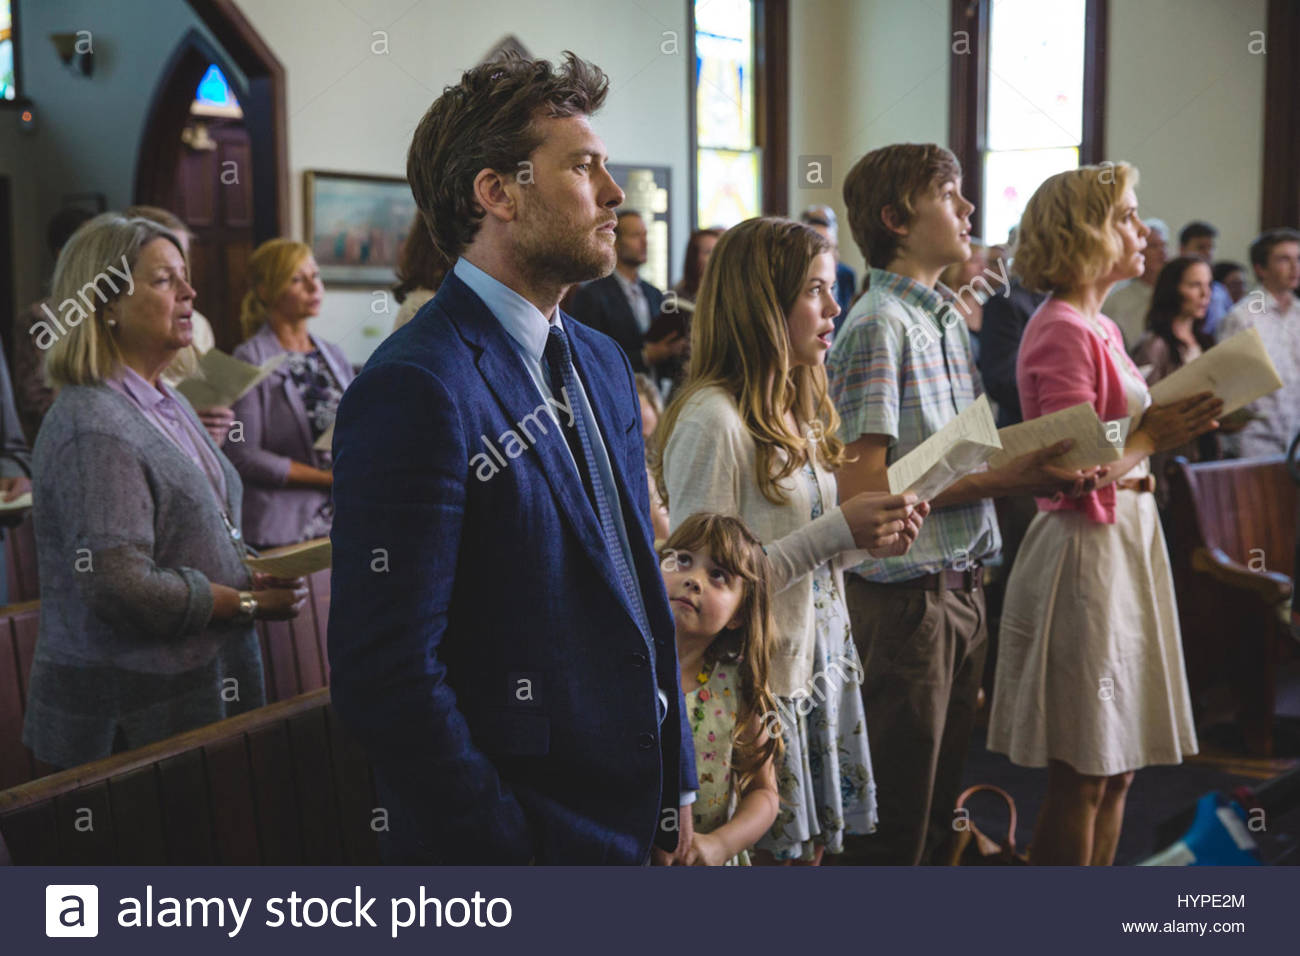 THE SHACK (2017)  SAM WORTHINGTON  STUART HAZELDINE (DIR)  SUMMIT ENTERTAINMENT/MOVIESTORE COLLECTION LTD - Stock Image